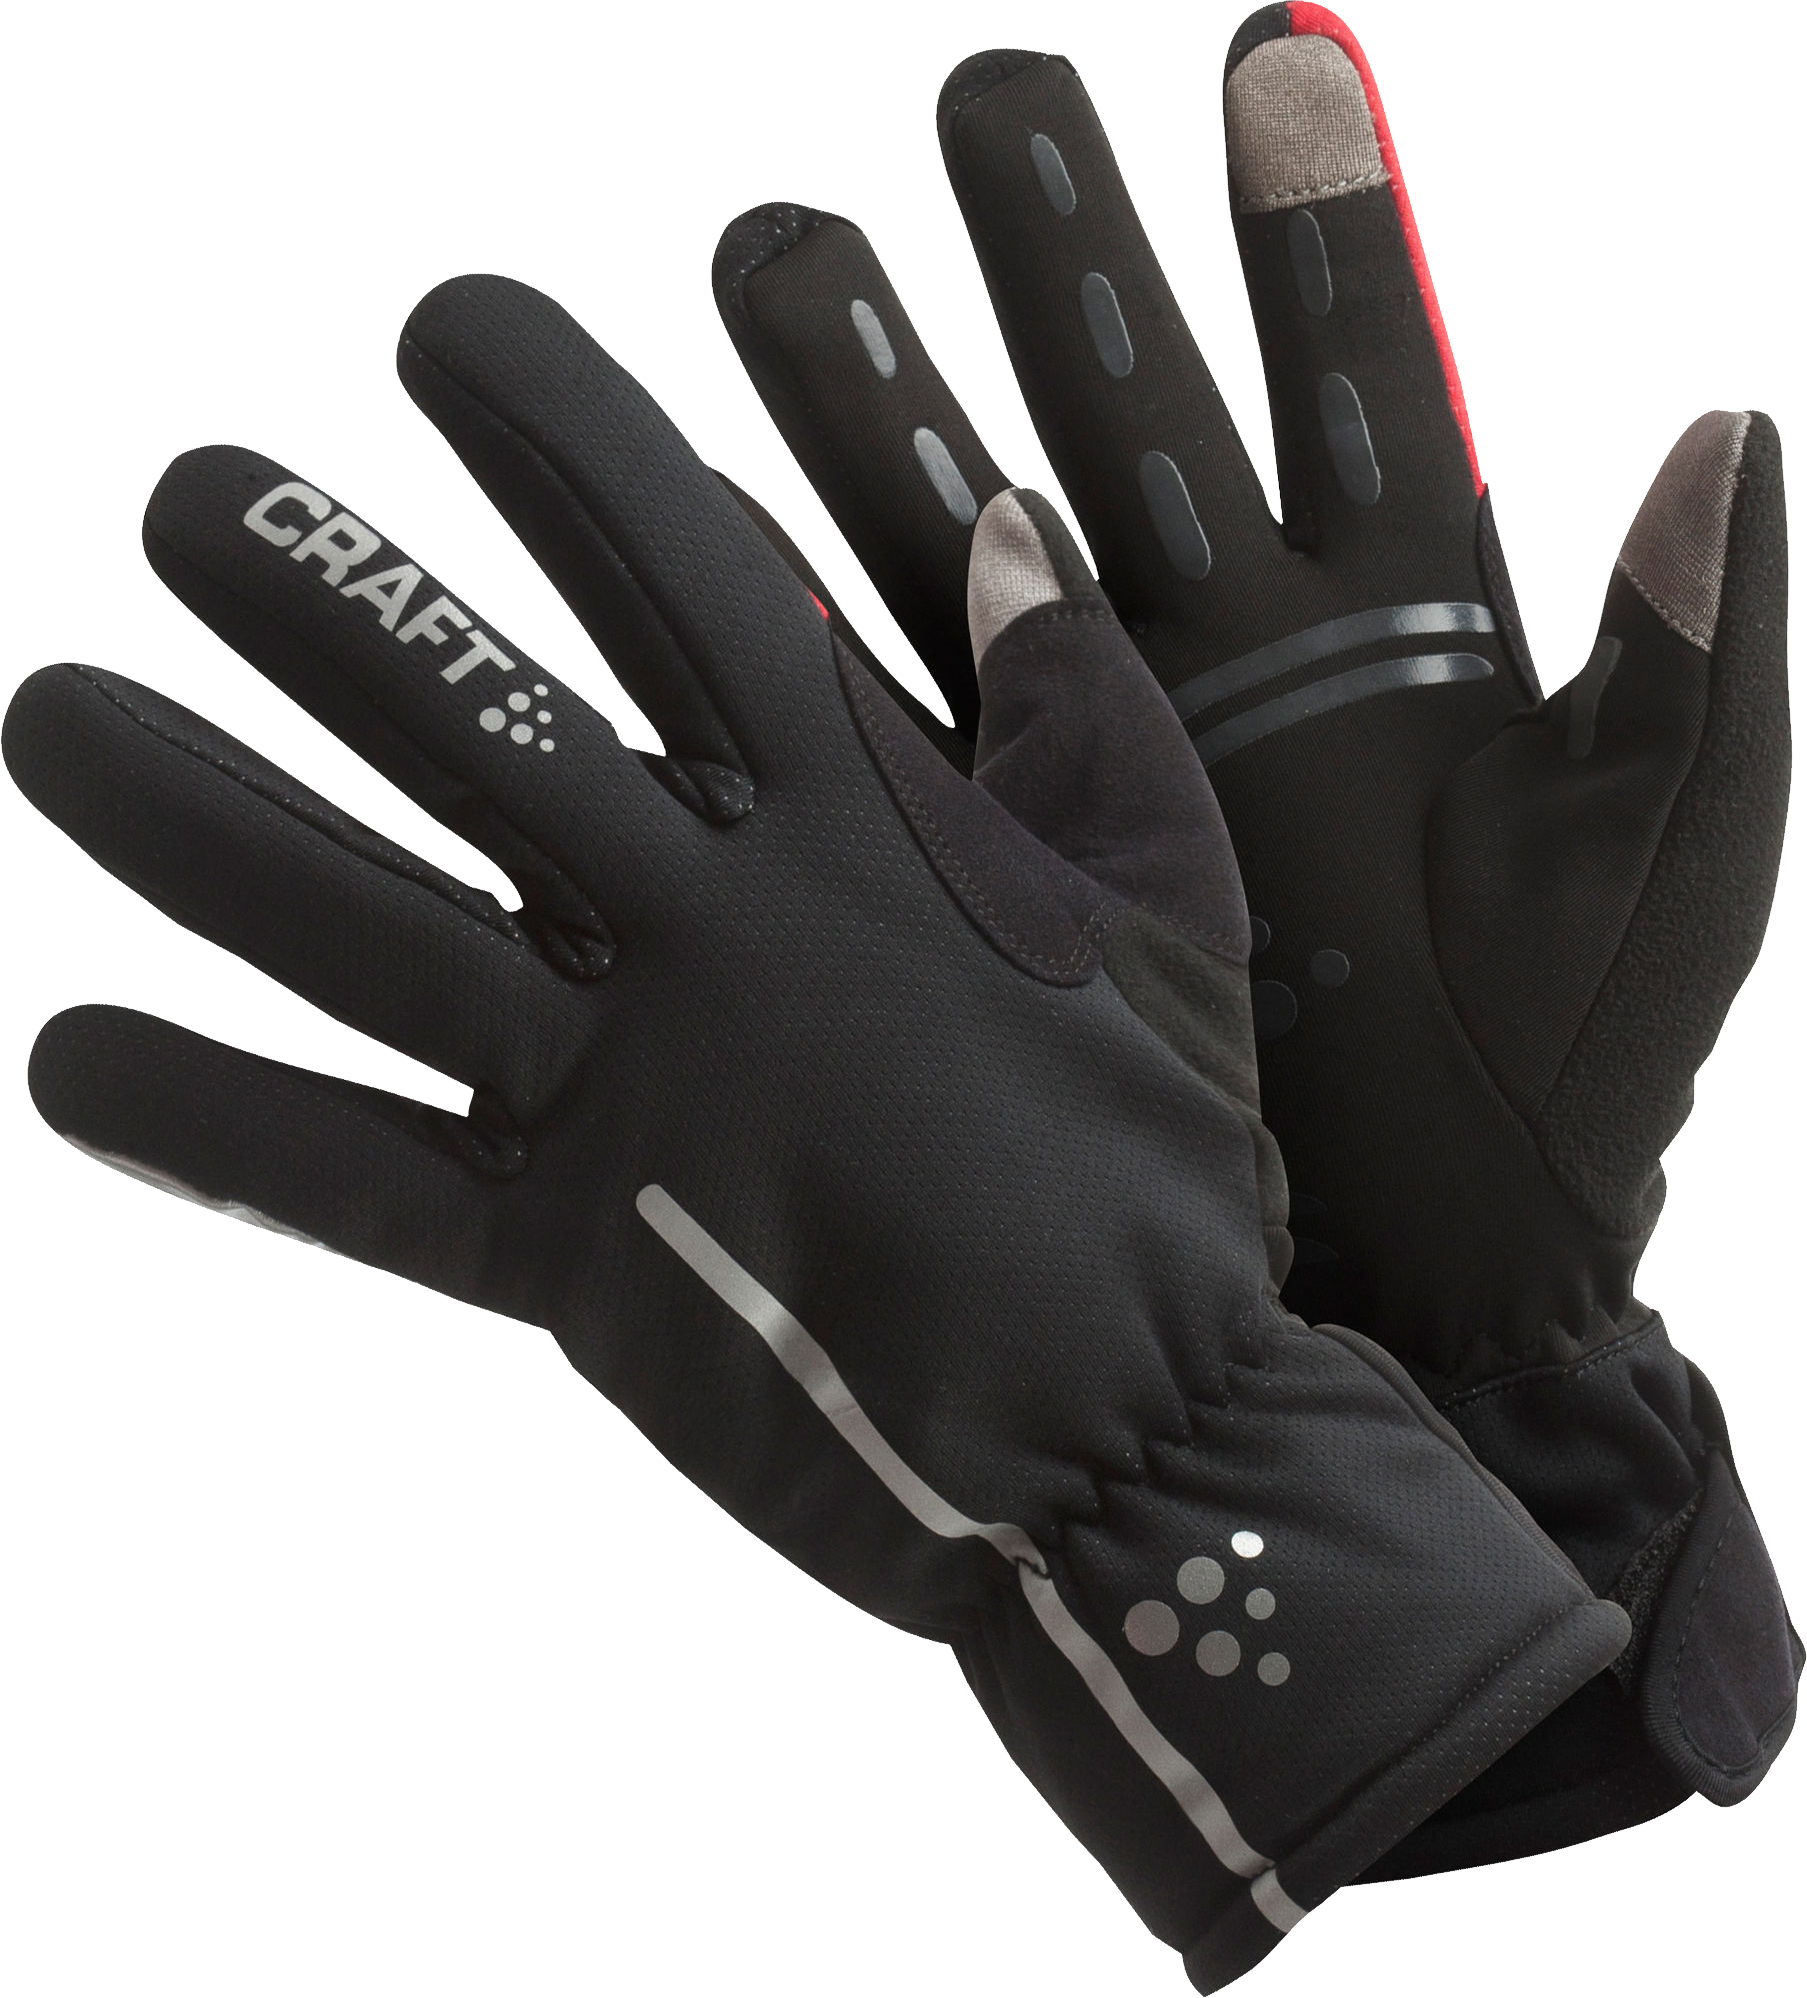 Sports Gloves PNG Image - PurePNG | Free transparent CC0 ...